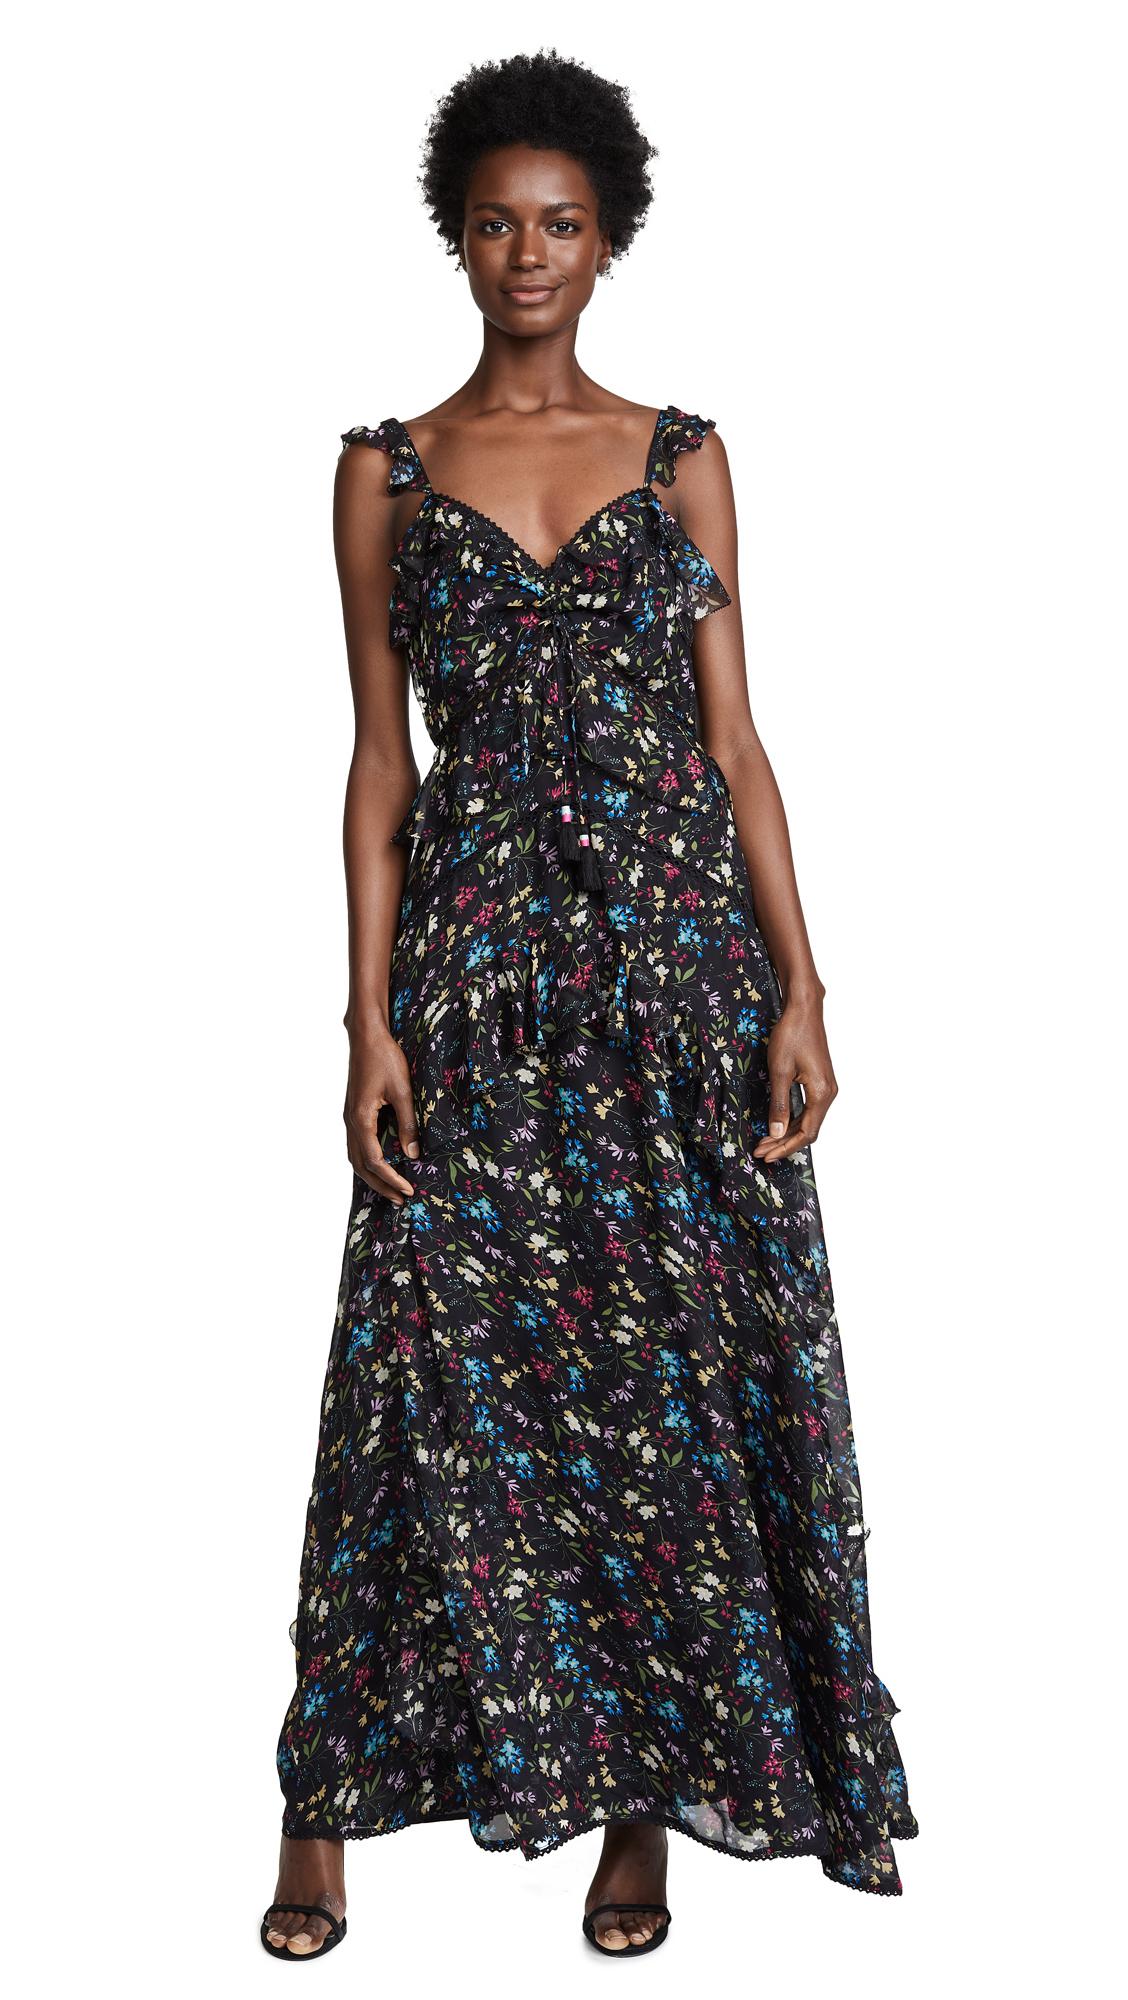 LOVE SAM Blossom Printed Maxi Dress in Black Floral